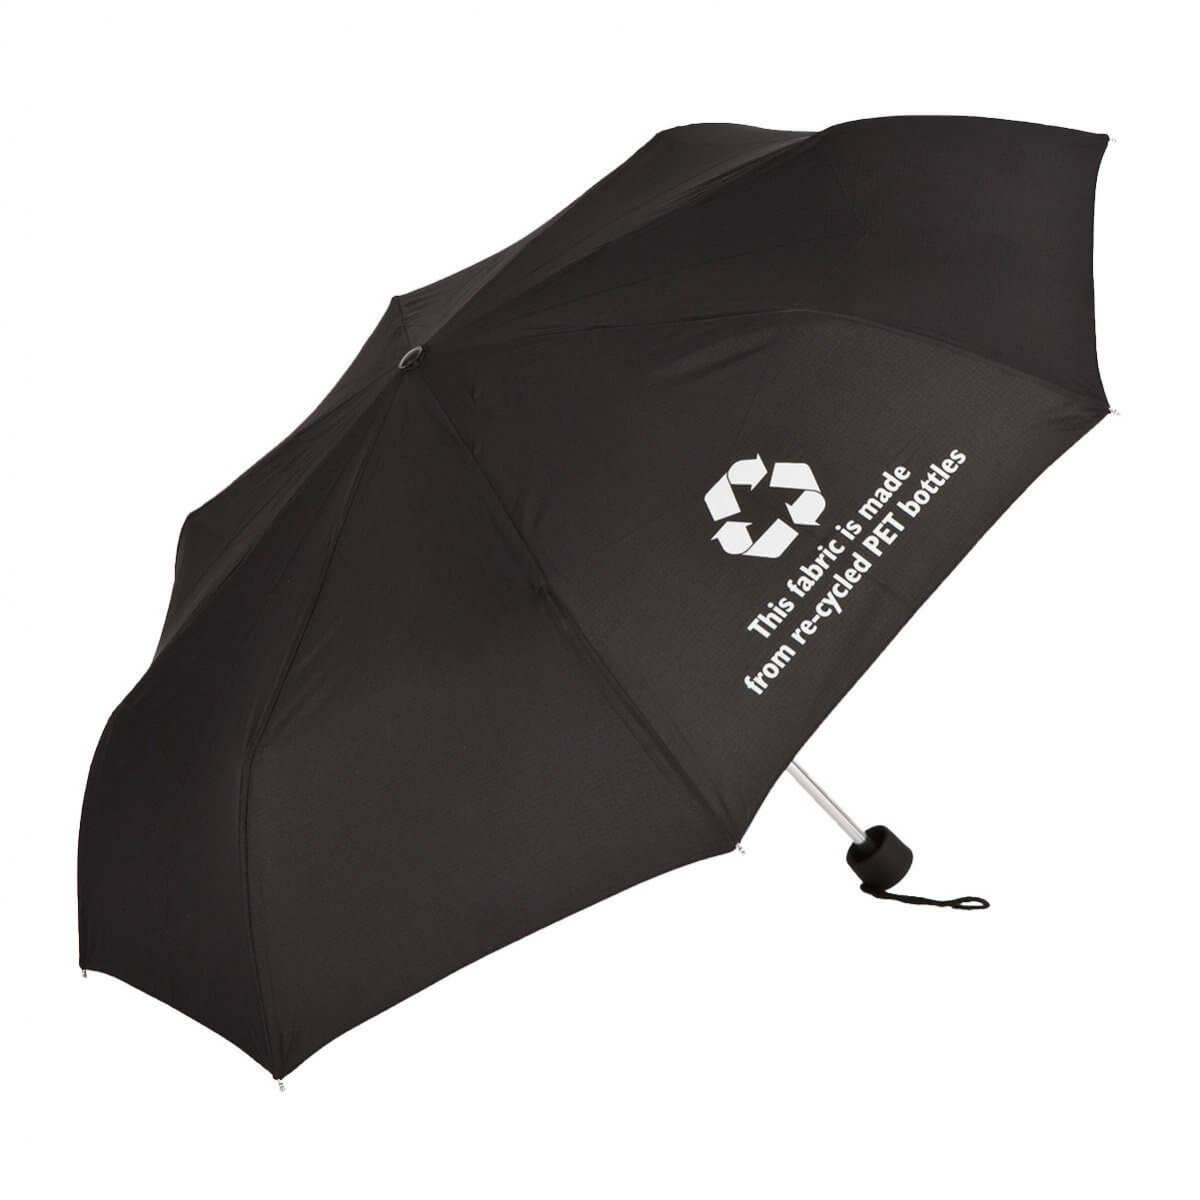 Recycled Folding Umbrella